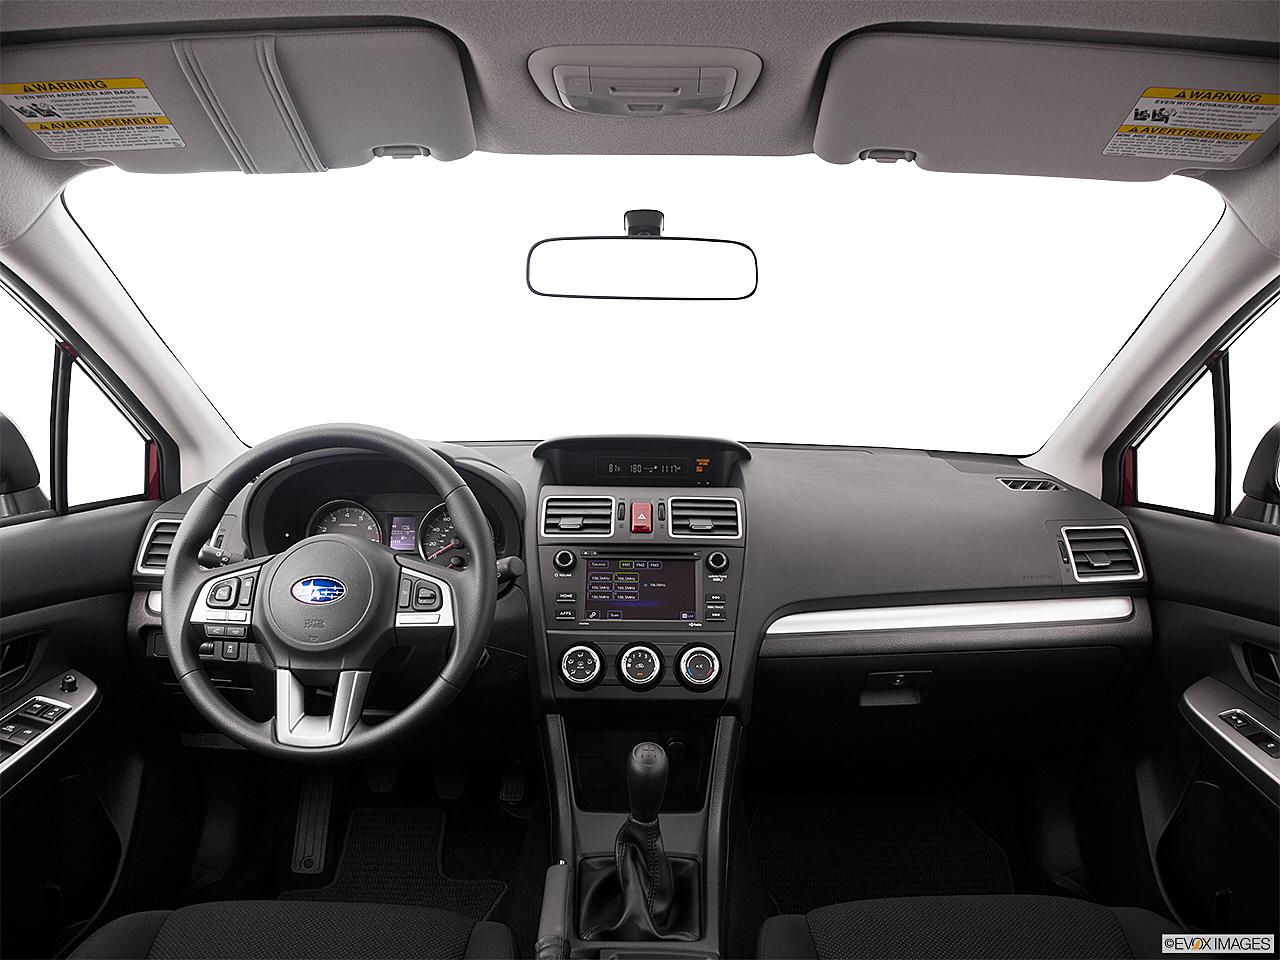 2017 subaru crosstrek awd special edition 4dr - Subaru crosstrek interior lighting ...